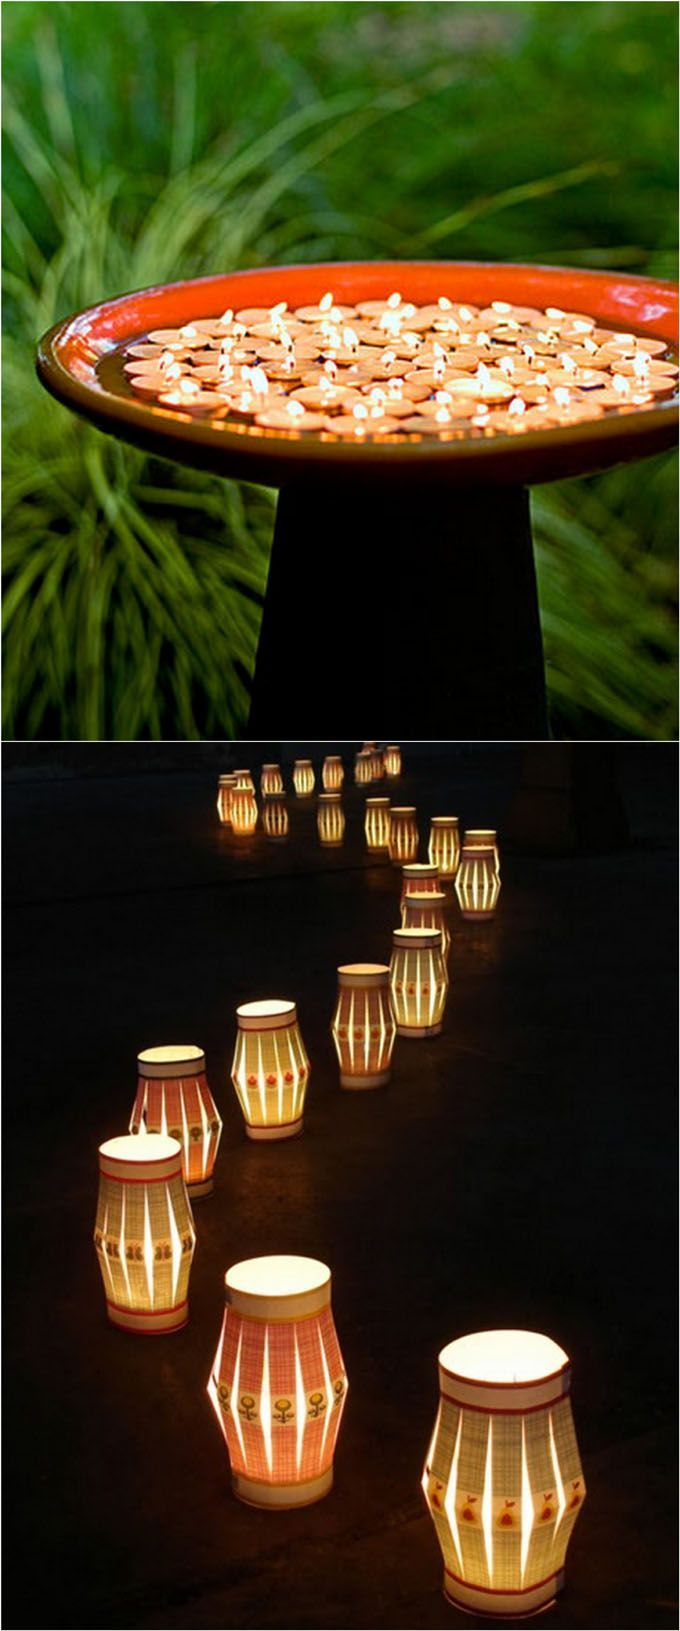 28 stunning diy outdoor lighting ideas so easy velos patios y 28 stunning easy diy outdoor lights from cedar path lights mason jar solar lights aloadofball Choice Image